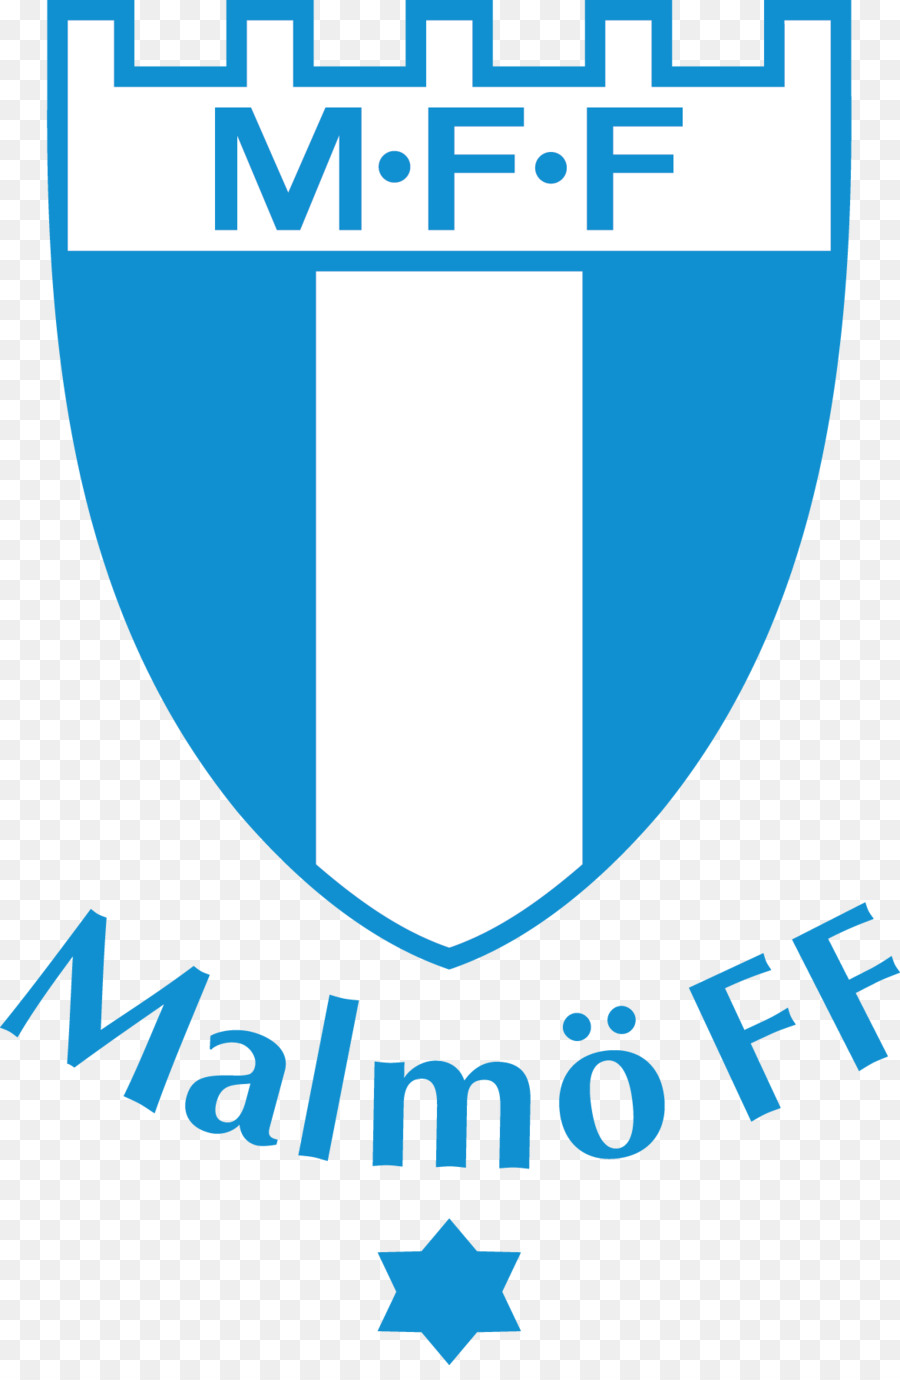 Football Logo Png Download 1172 1778 Free Transparent Allsvenskan Png Download Cleanpng Kisspng